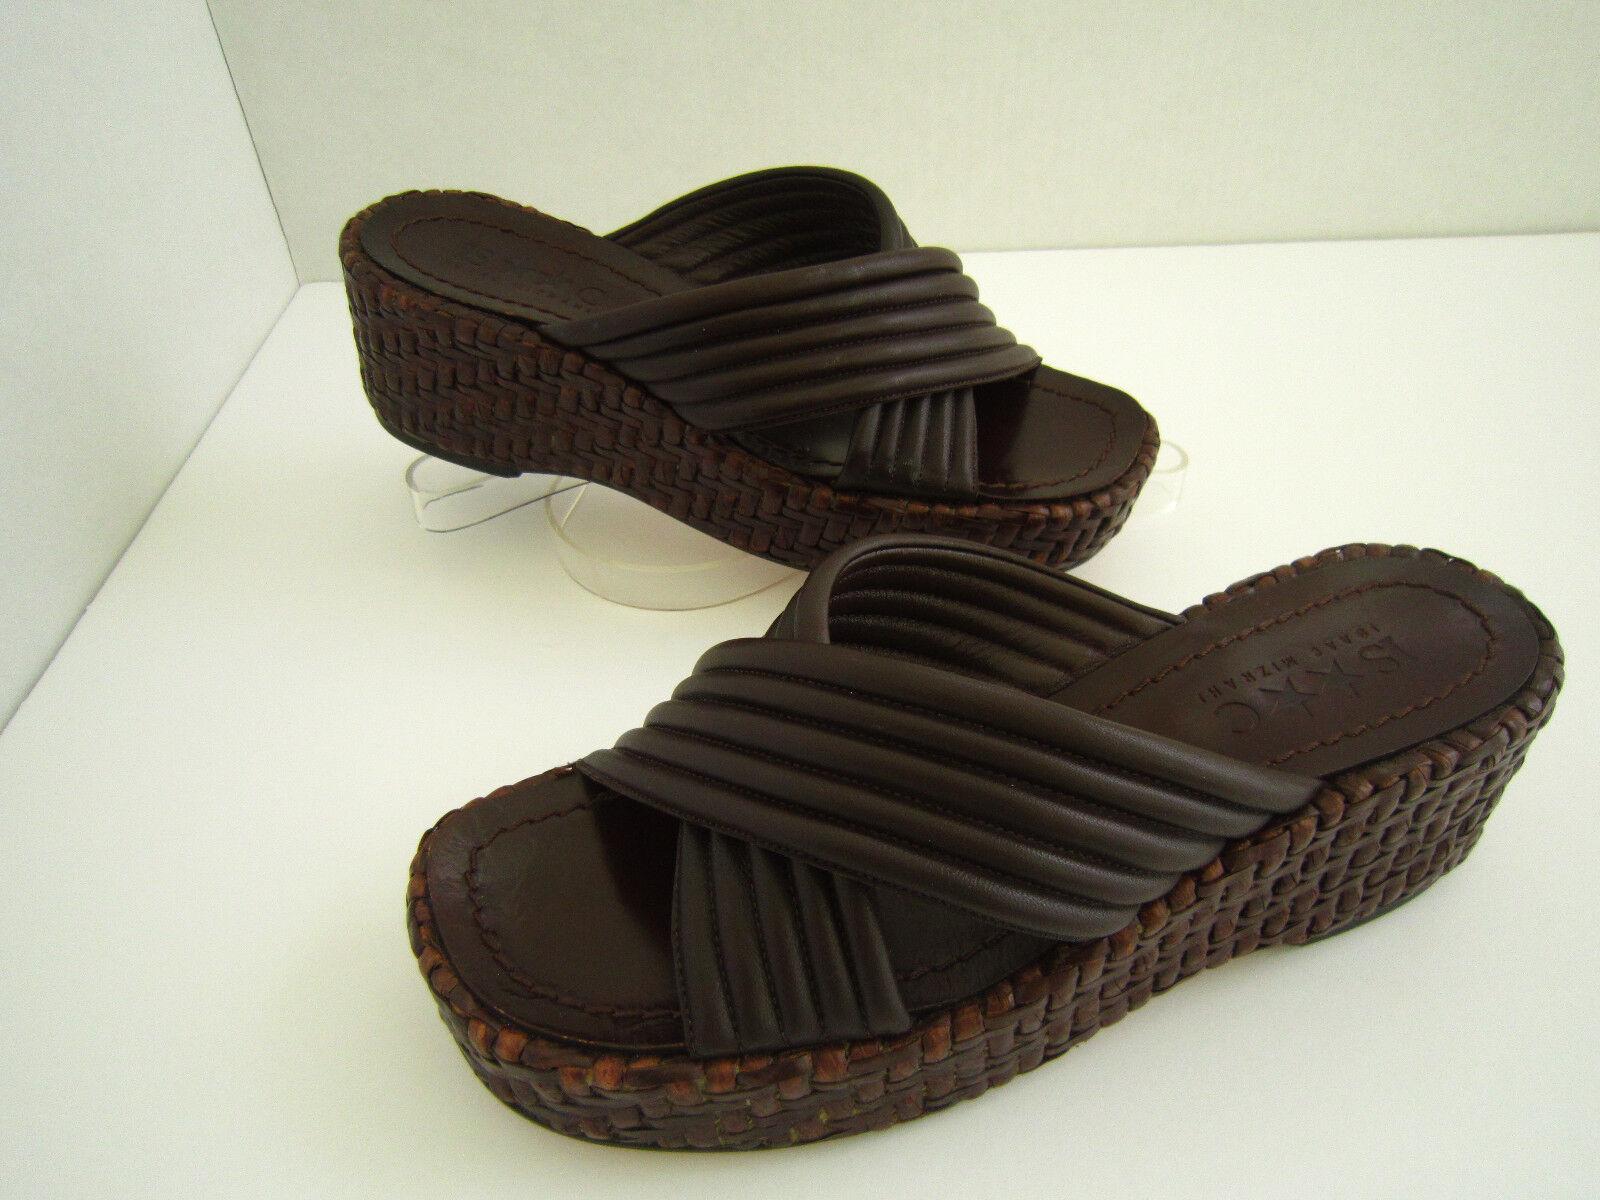 Isaac Mizrahi En Cuir marron Tissé Slide Sandales Taille 8 M Italie